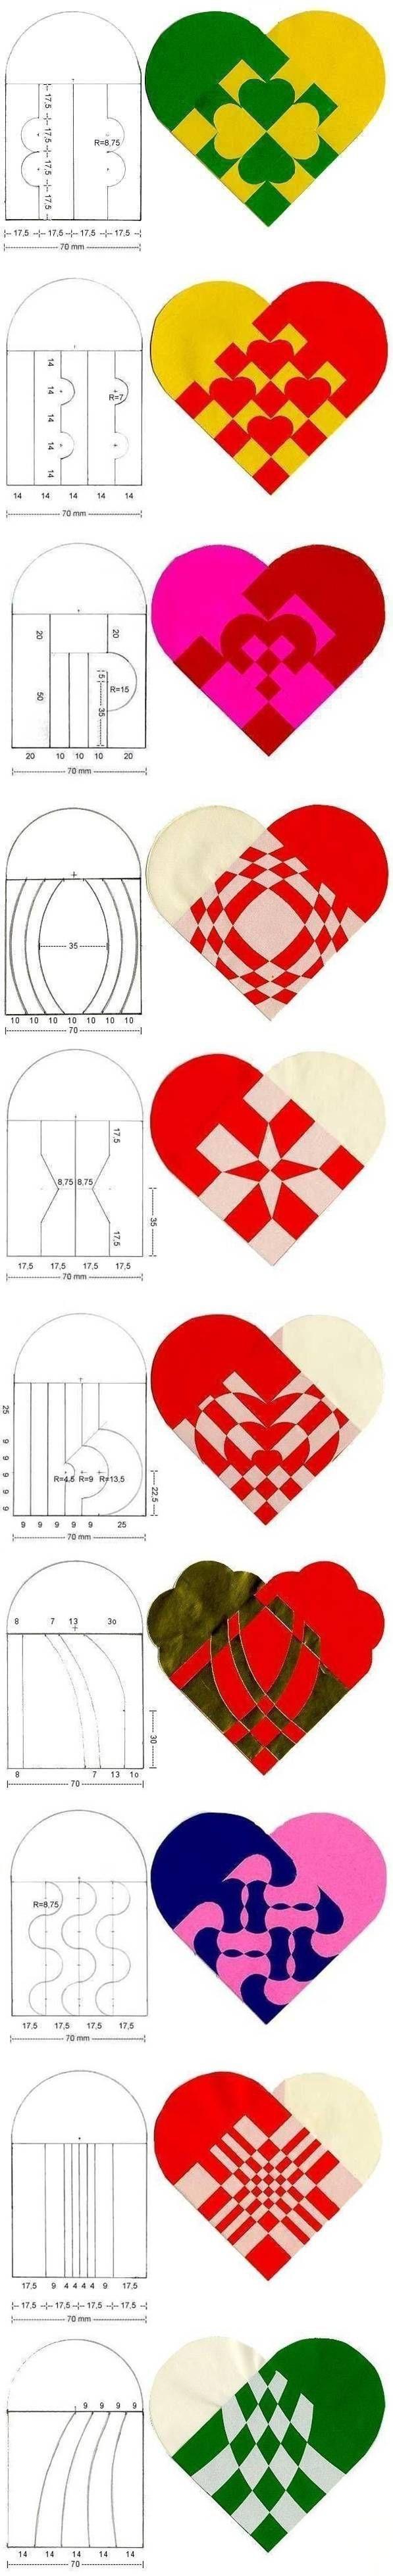 DIY Fabulous Heart Patterns DIY Projects | UsefulDIY.com